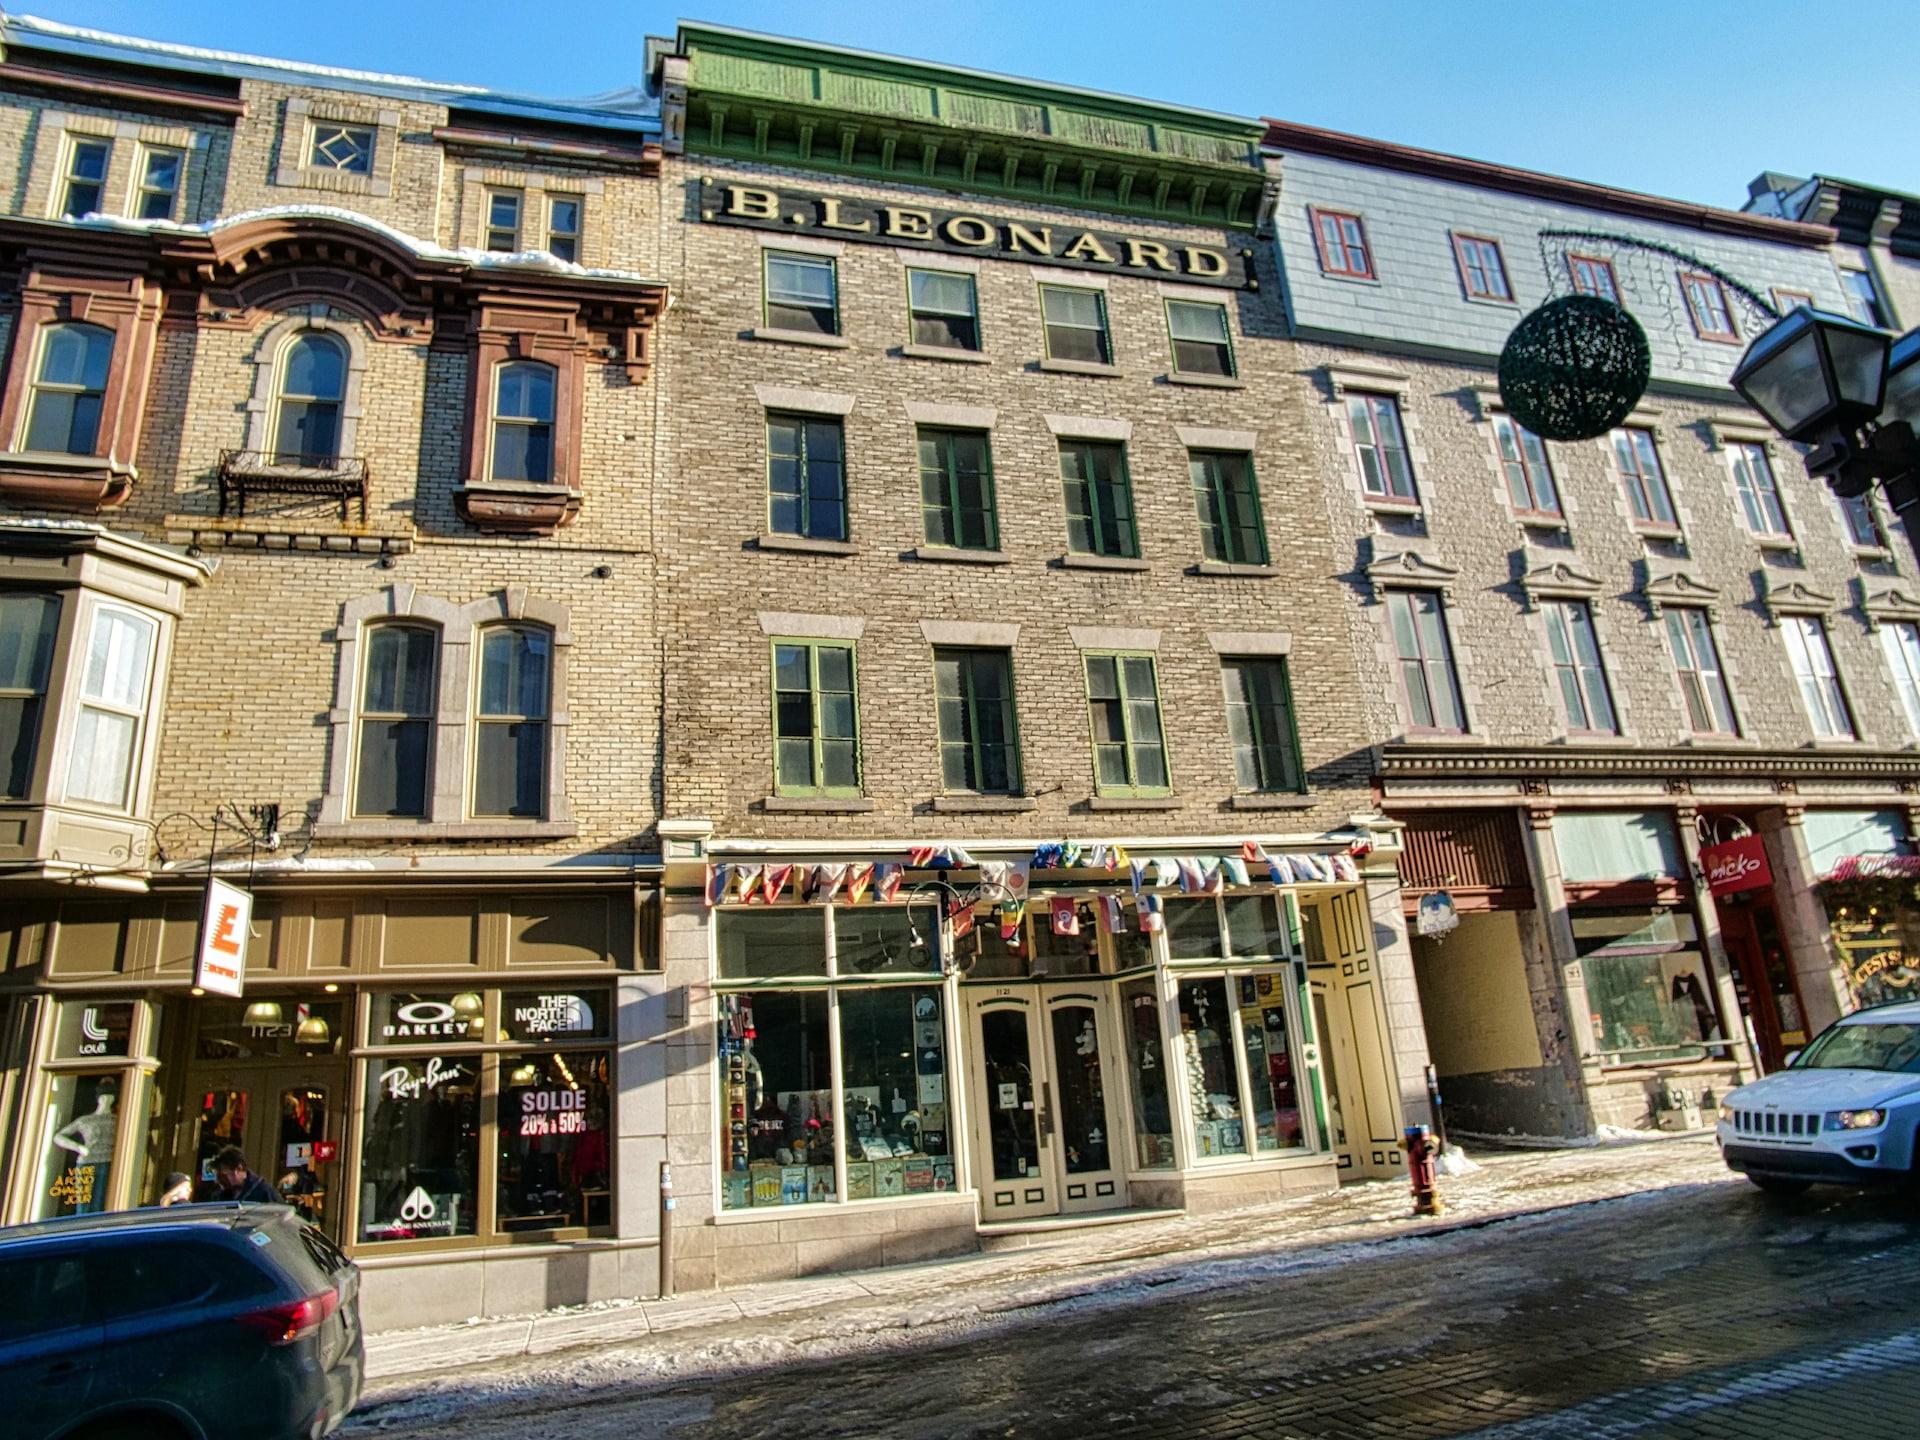 D'énormes lettres dorées B.Leonard s'étalent, bien visibles en haut d'un édifice de briques de la rue Saint-Jean.